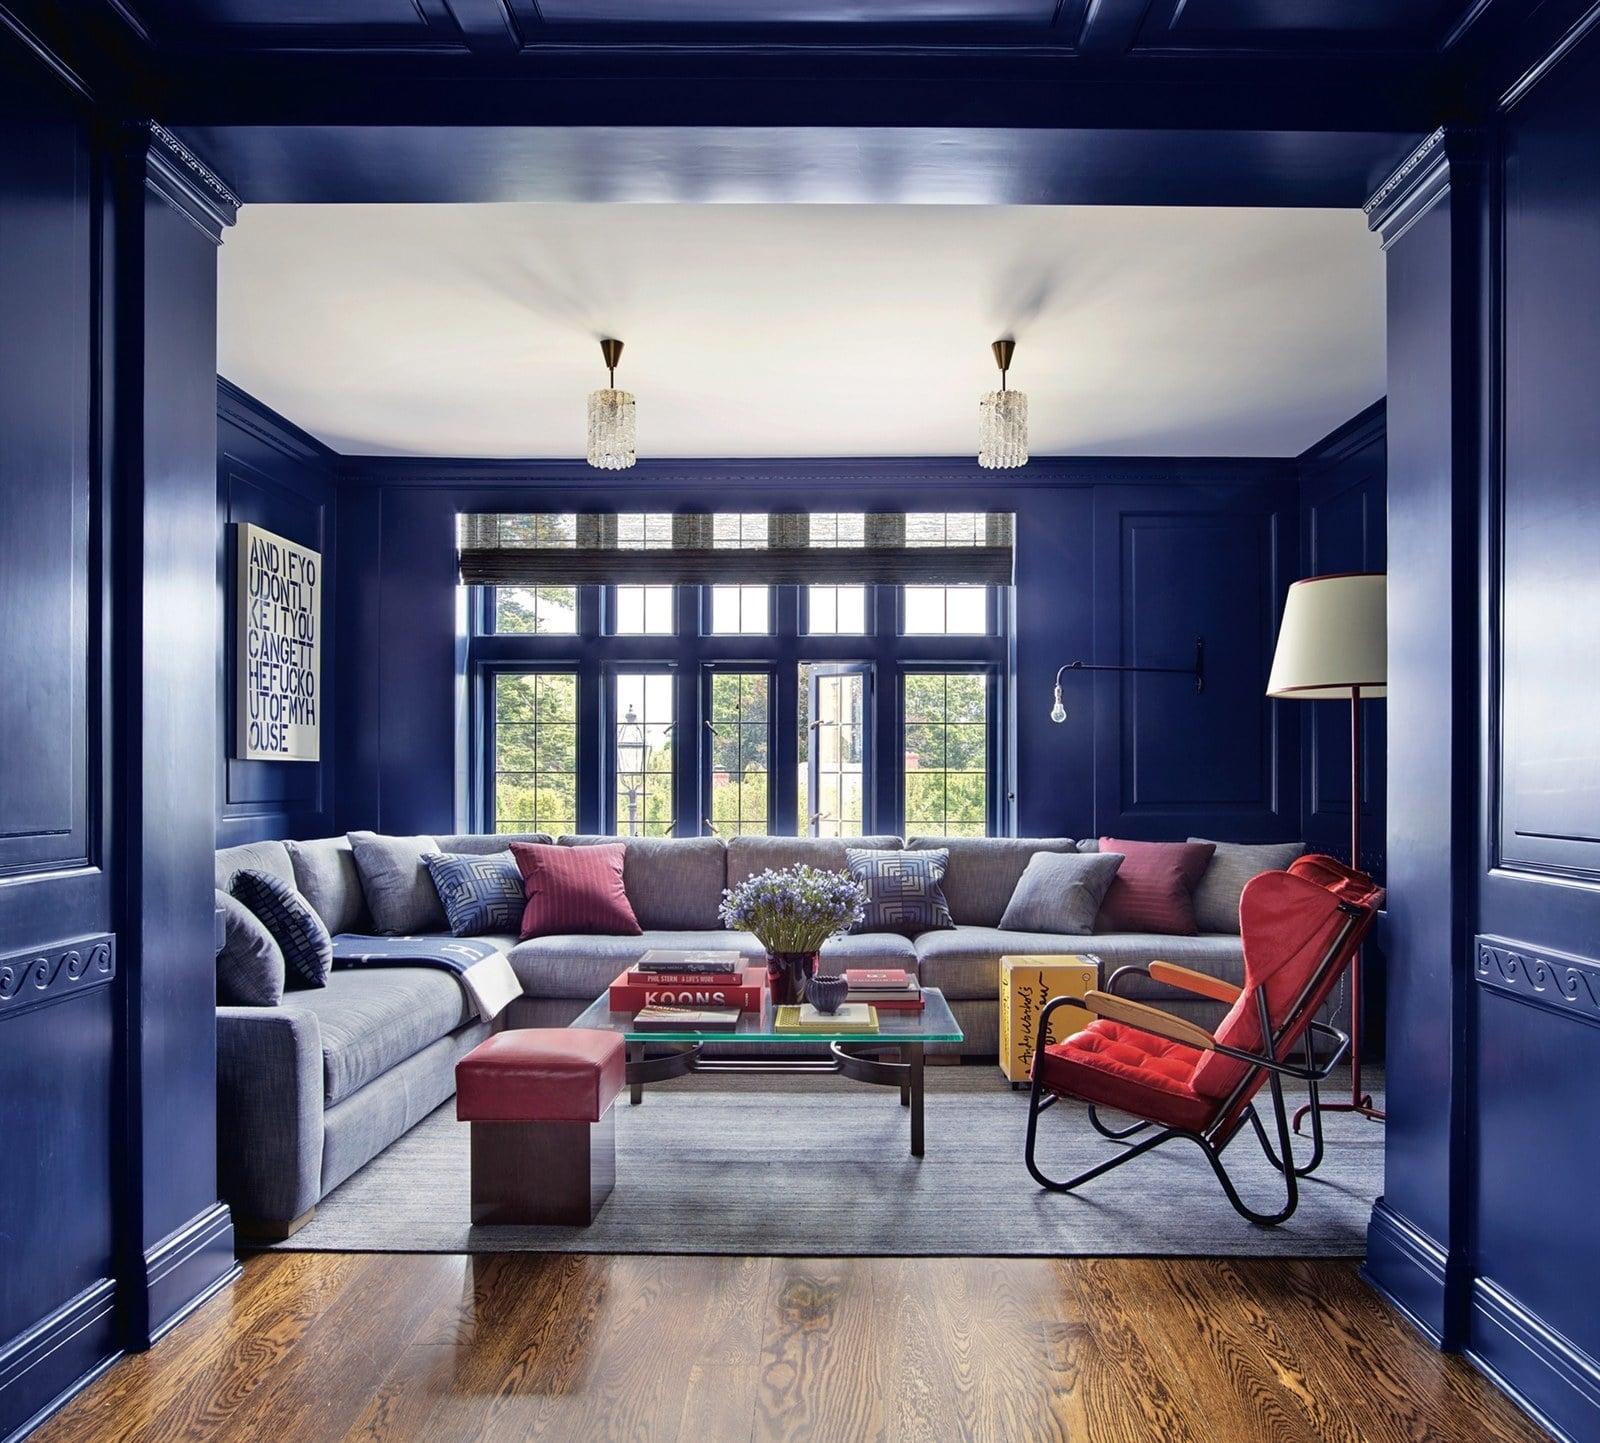 دکوراسیون خانه با آبی کلاسیک